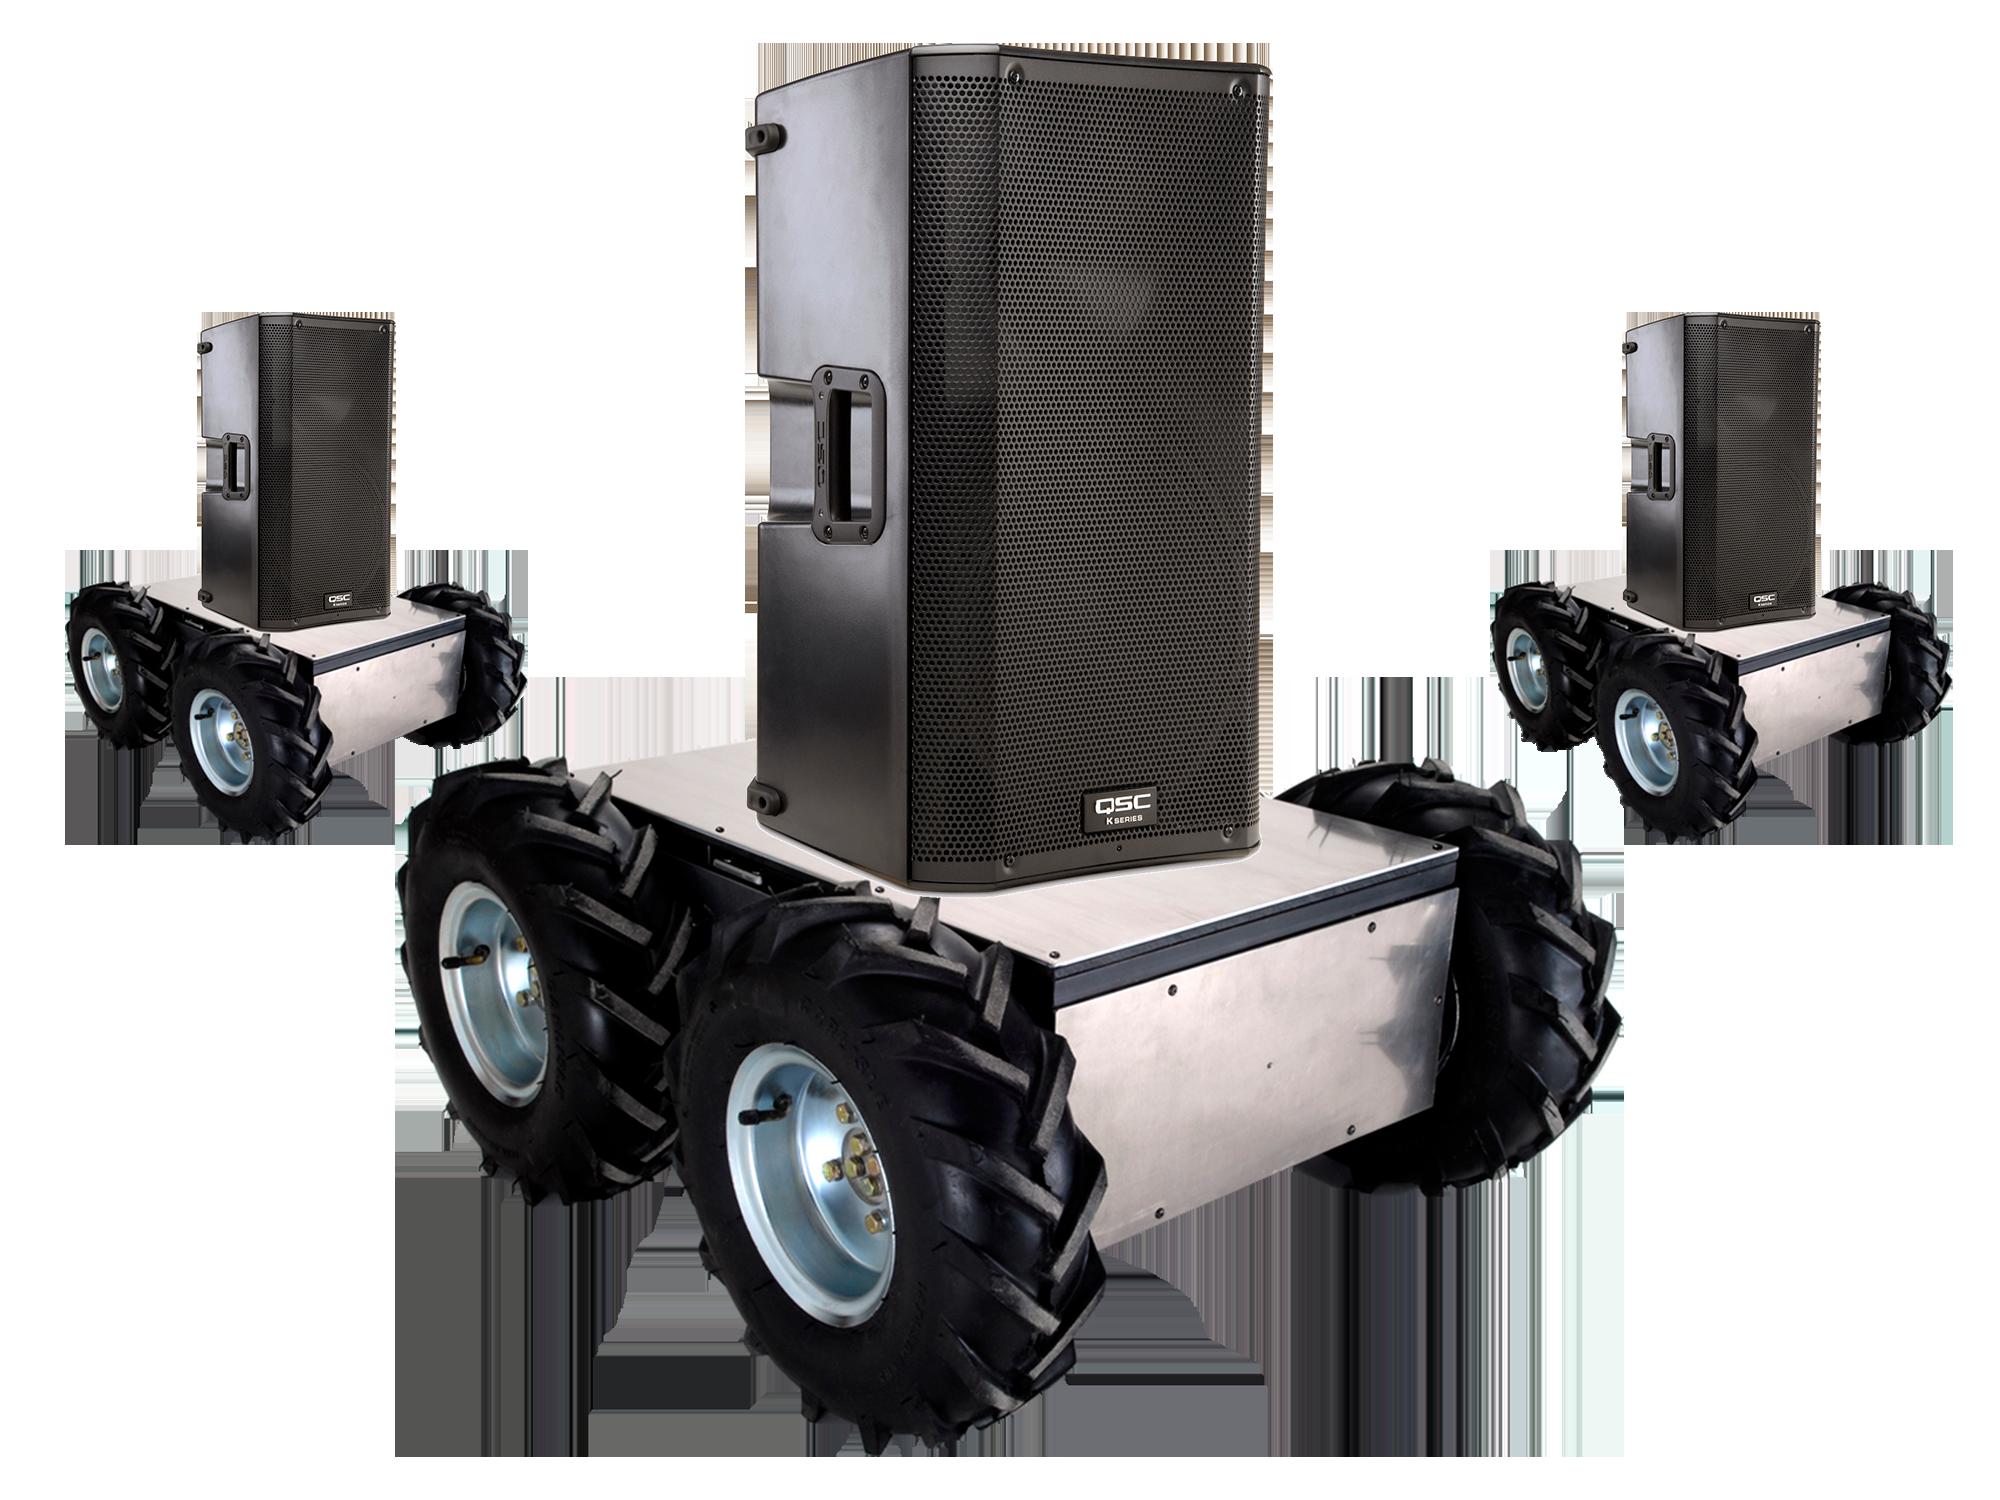 robot-platform.png